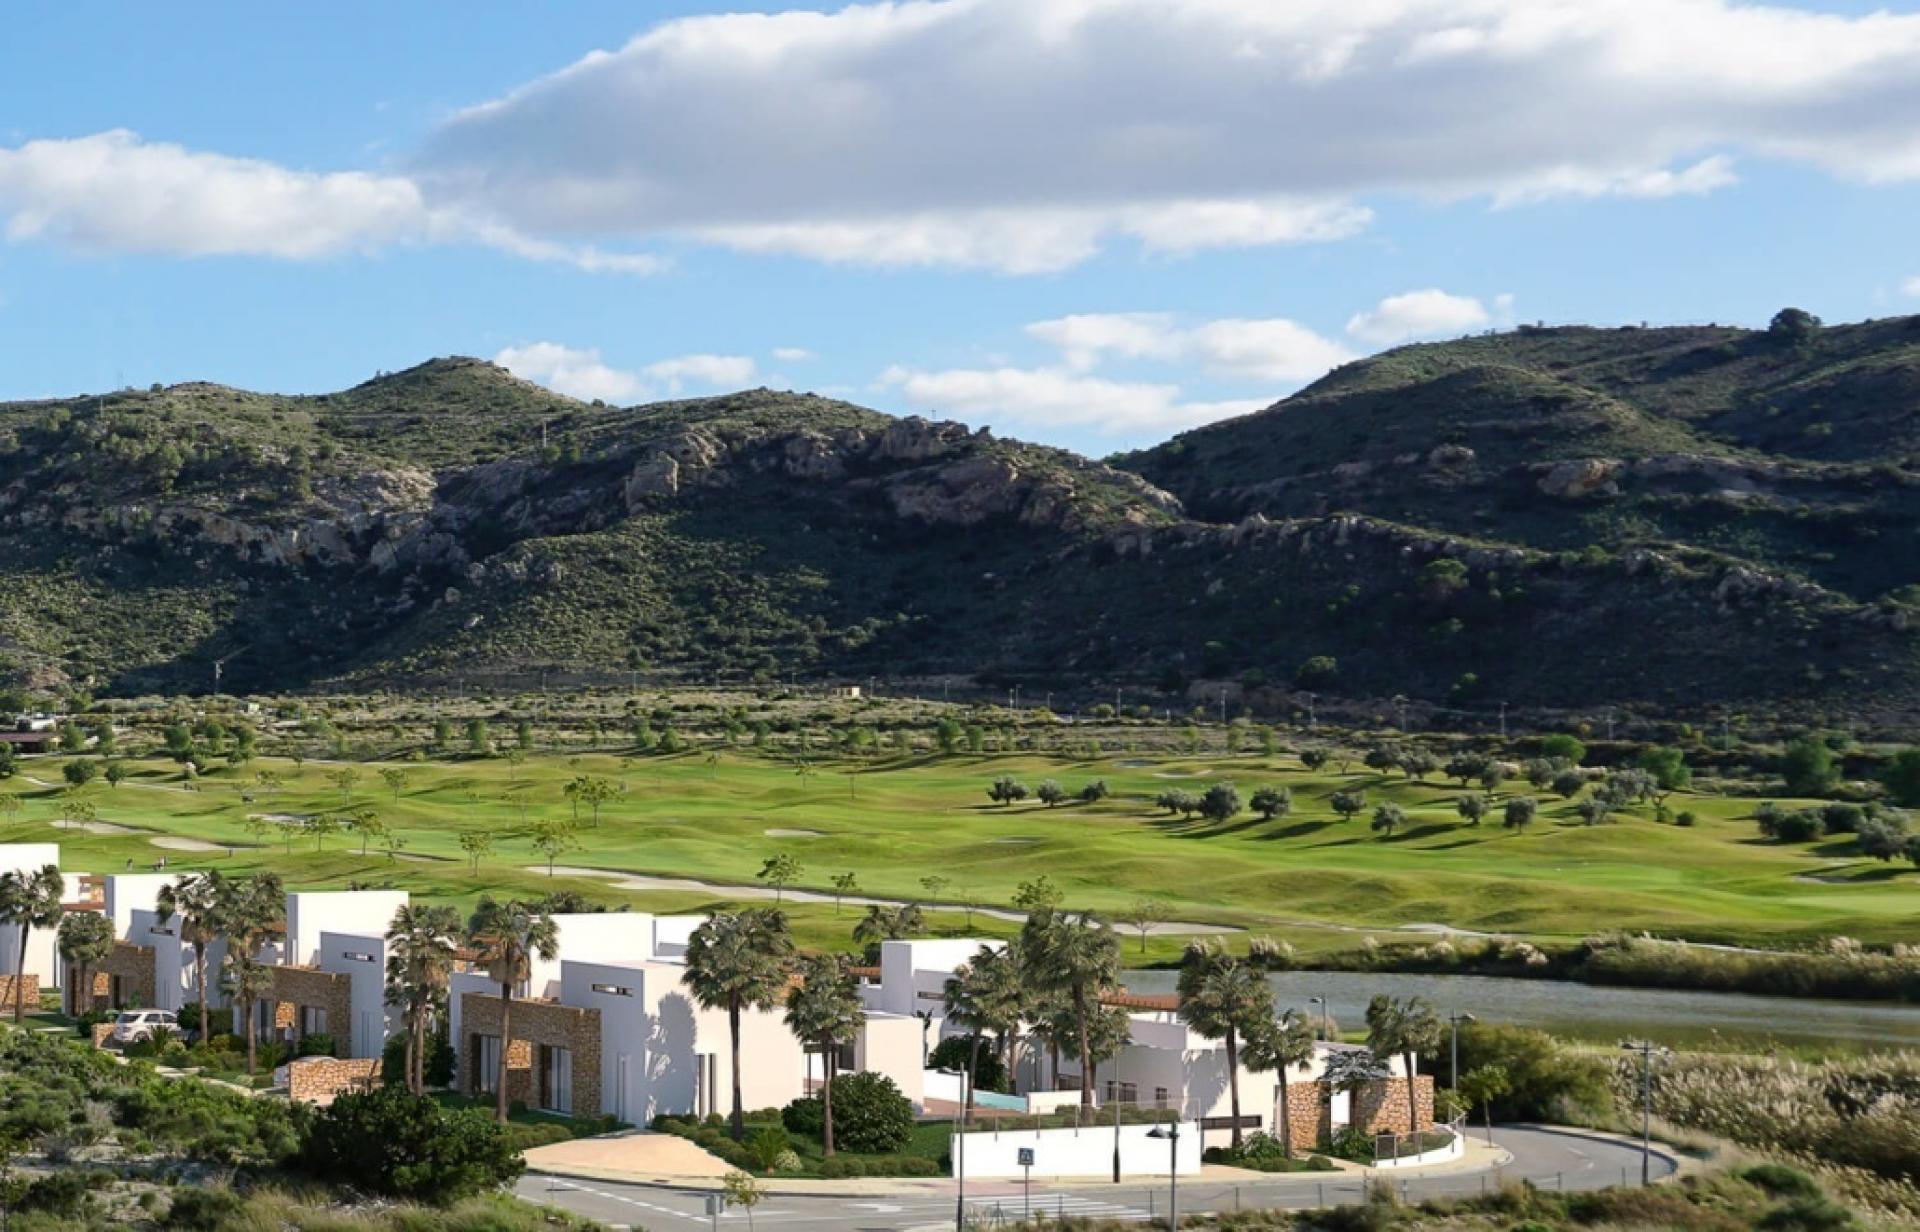 Maison de ville sur le complexe de golf exclusif Font Del Llop, Aspe - Costa Blanca in Medvilla Spanje